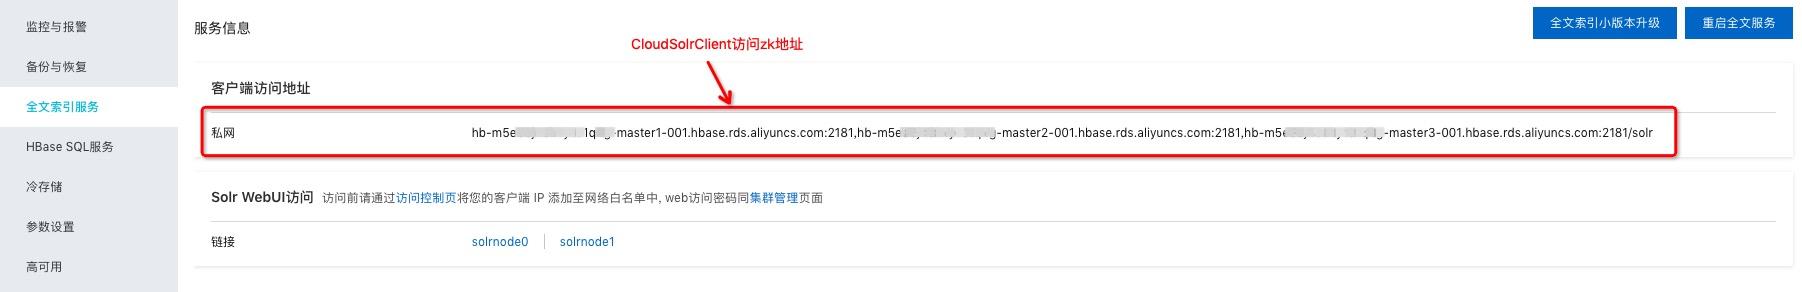 cloudSolrClient访问地址